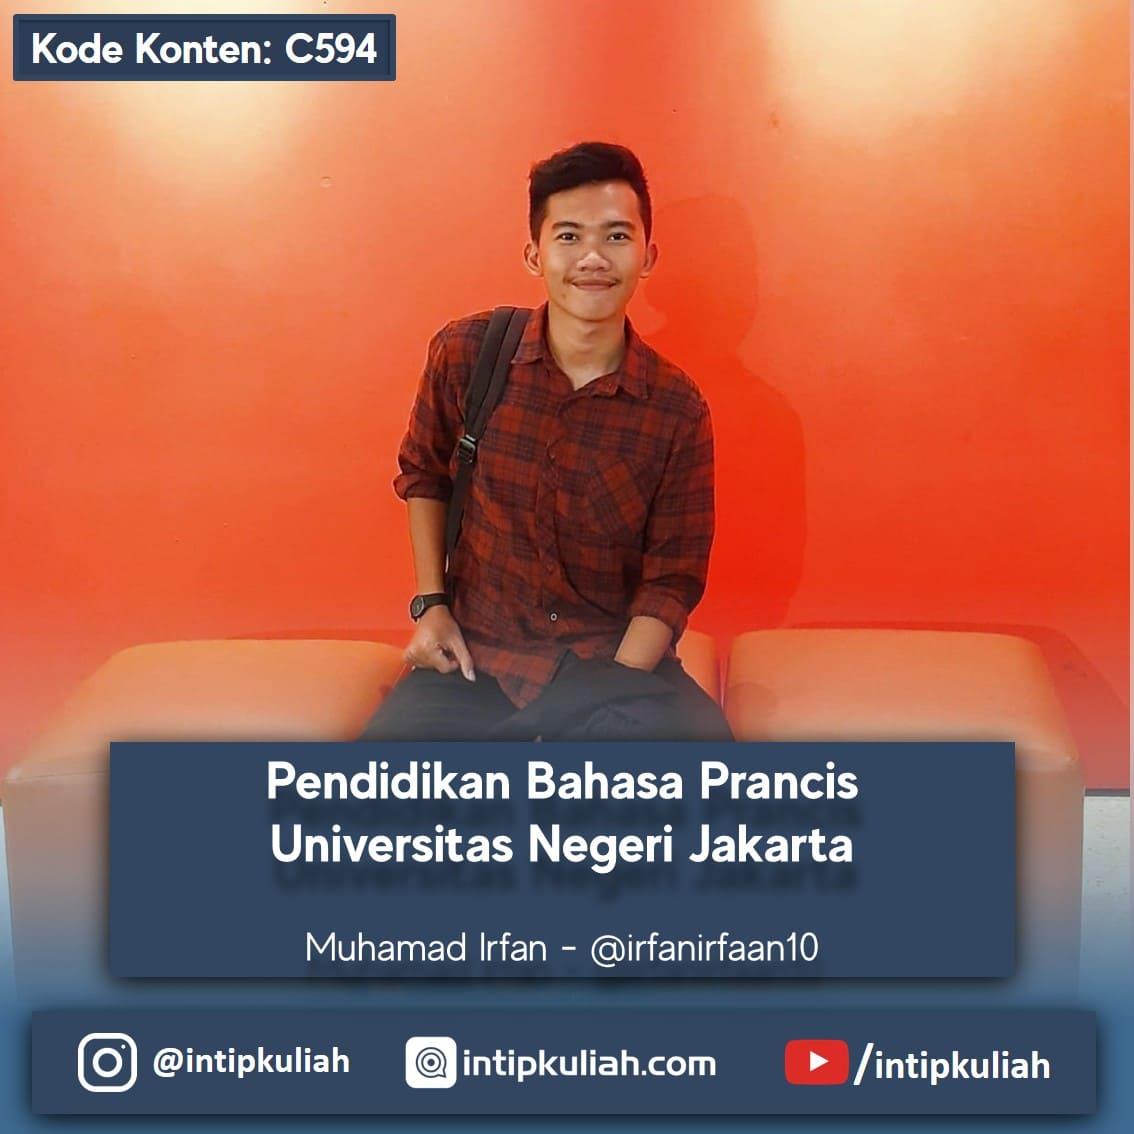 Pendidikan Bahasa Prancis Universitas Negeri Jakarta (Irfan)